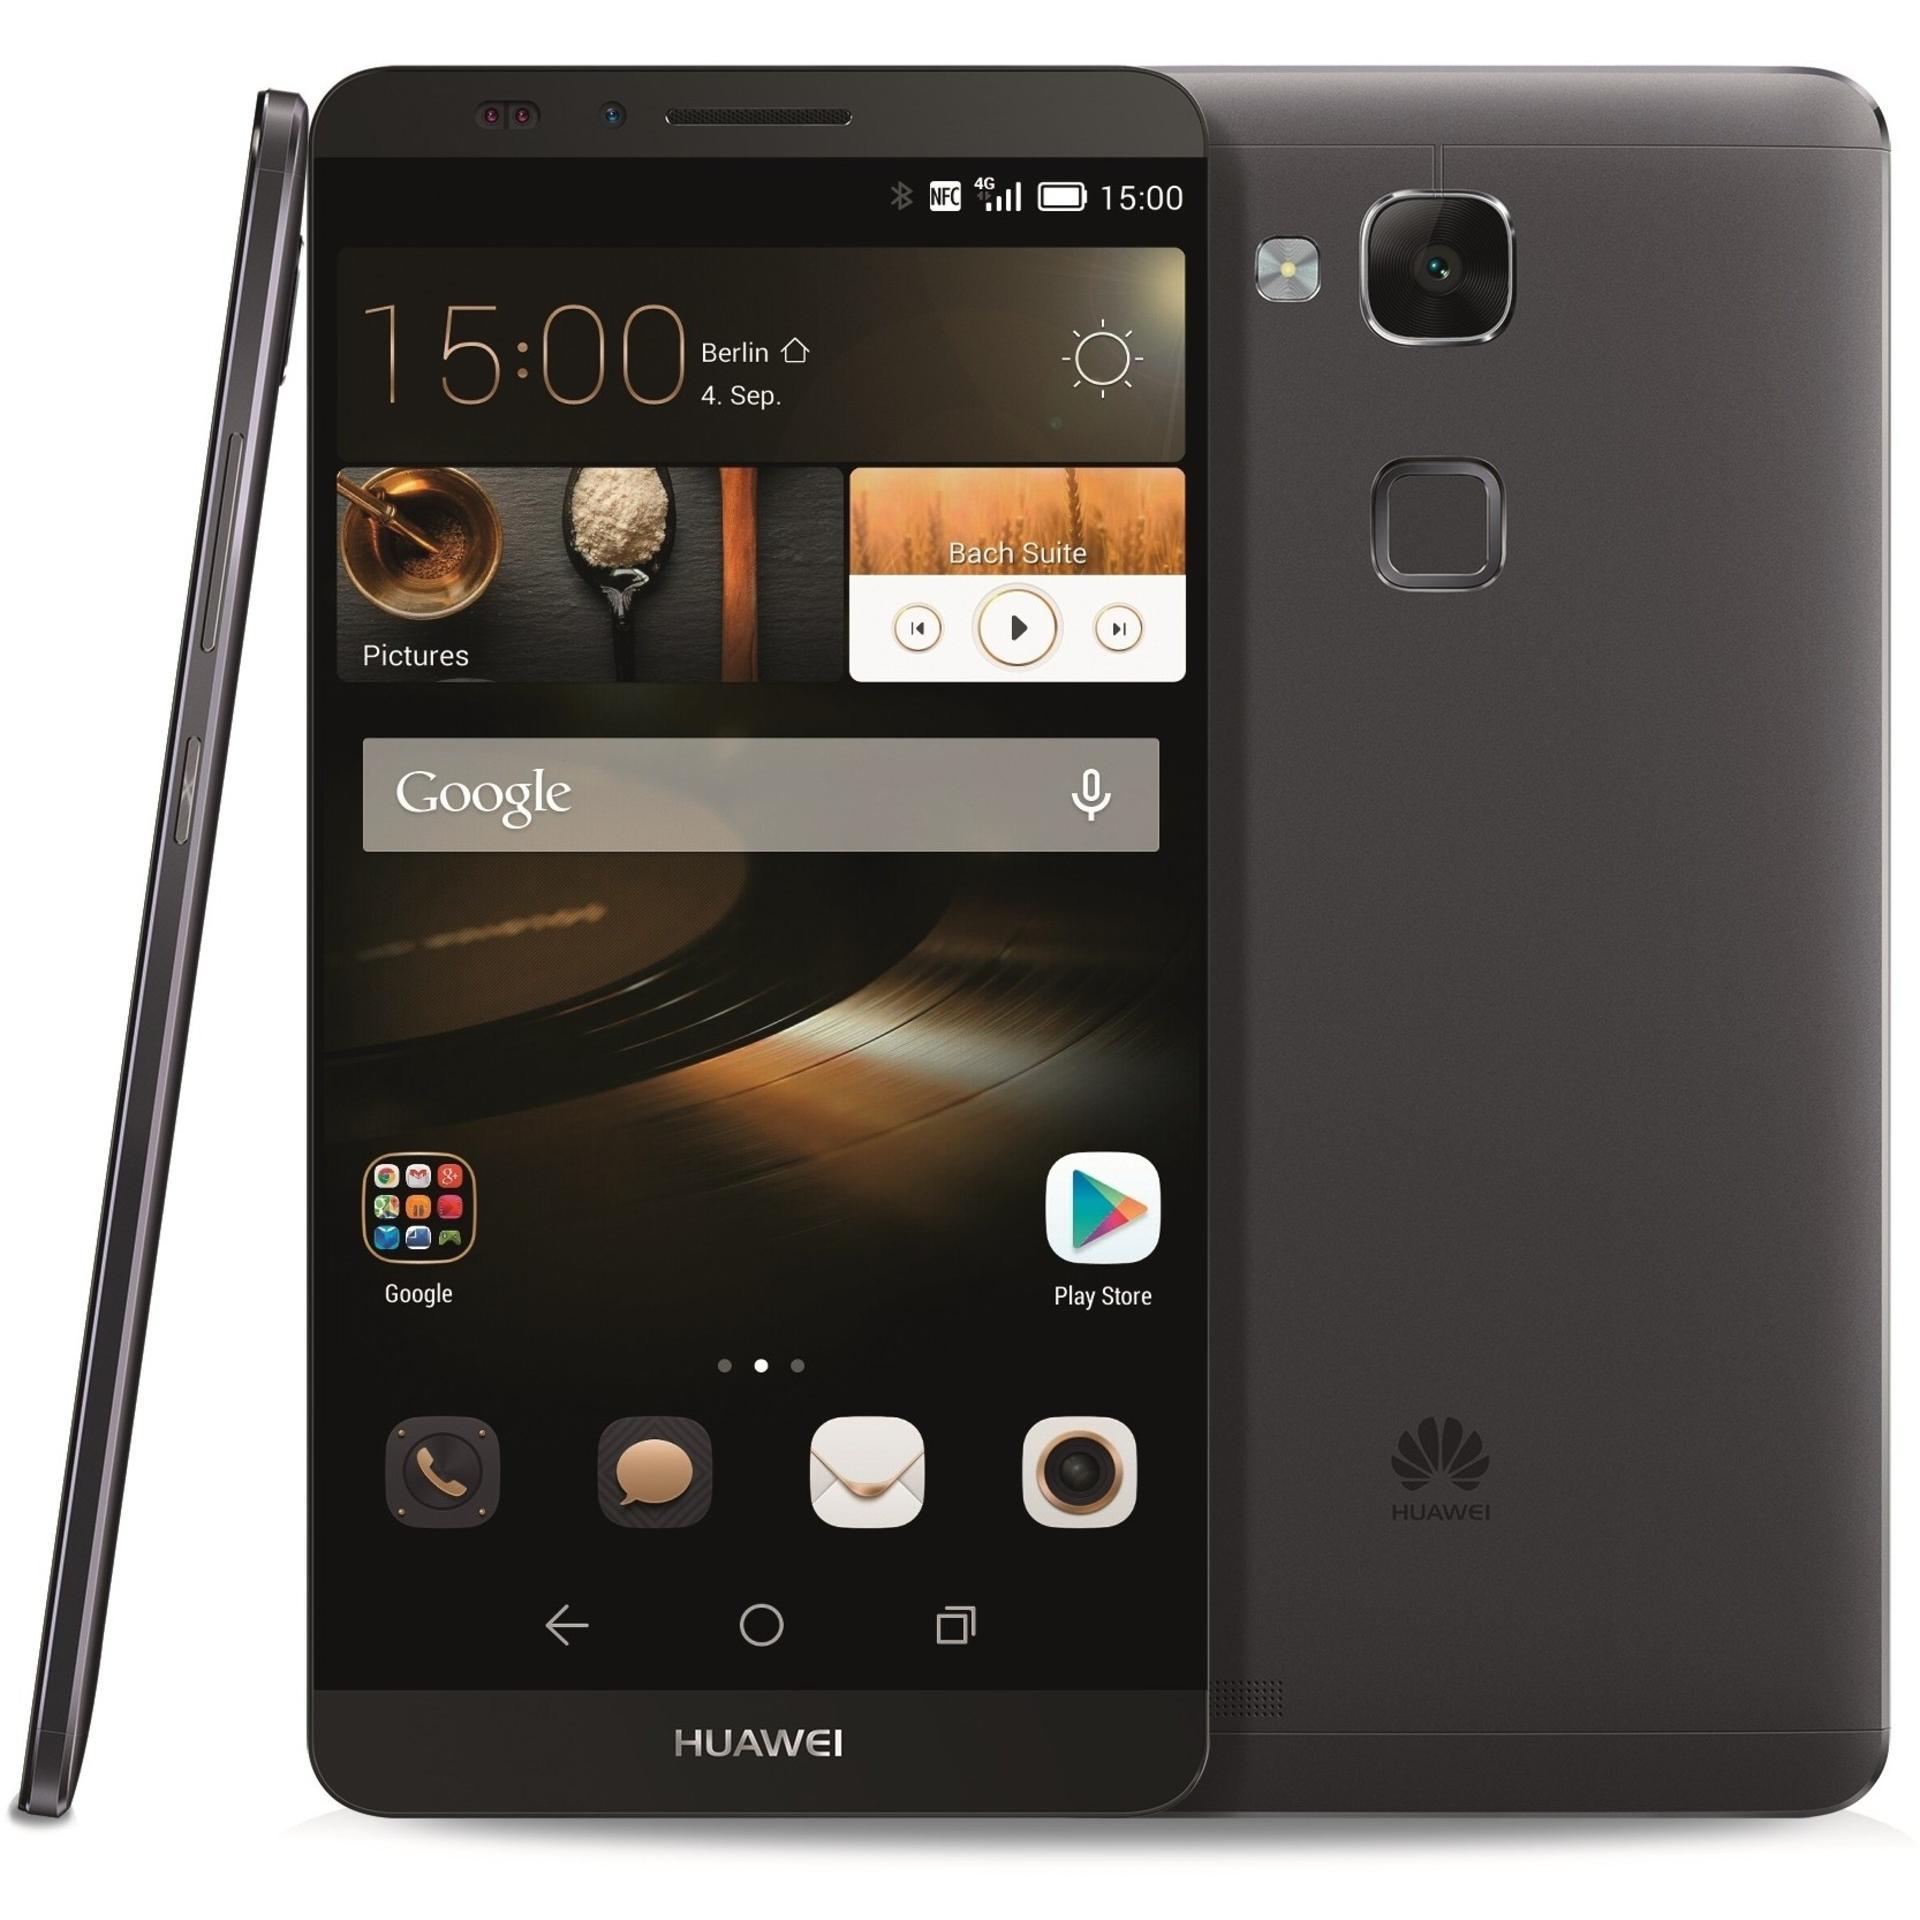 Huawei Ascend Mate 7 16GB - Schwarz - Ohne Vertrag